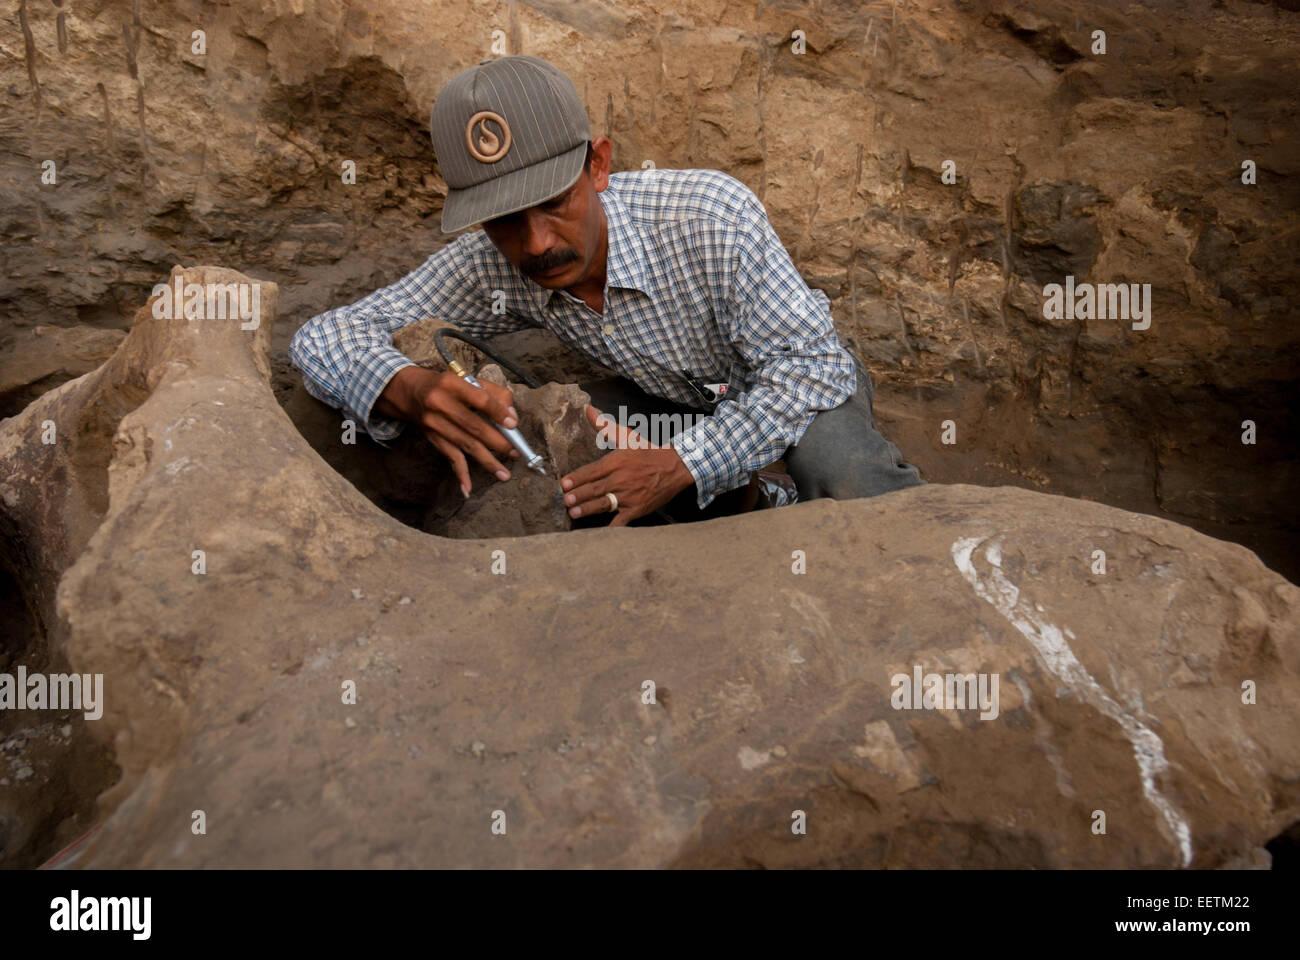 Palaeontologist Iwan Kurniawan excavating fossils of ancient elephant, Elephas hysudrindicus, in Blora regency, - Stock Image